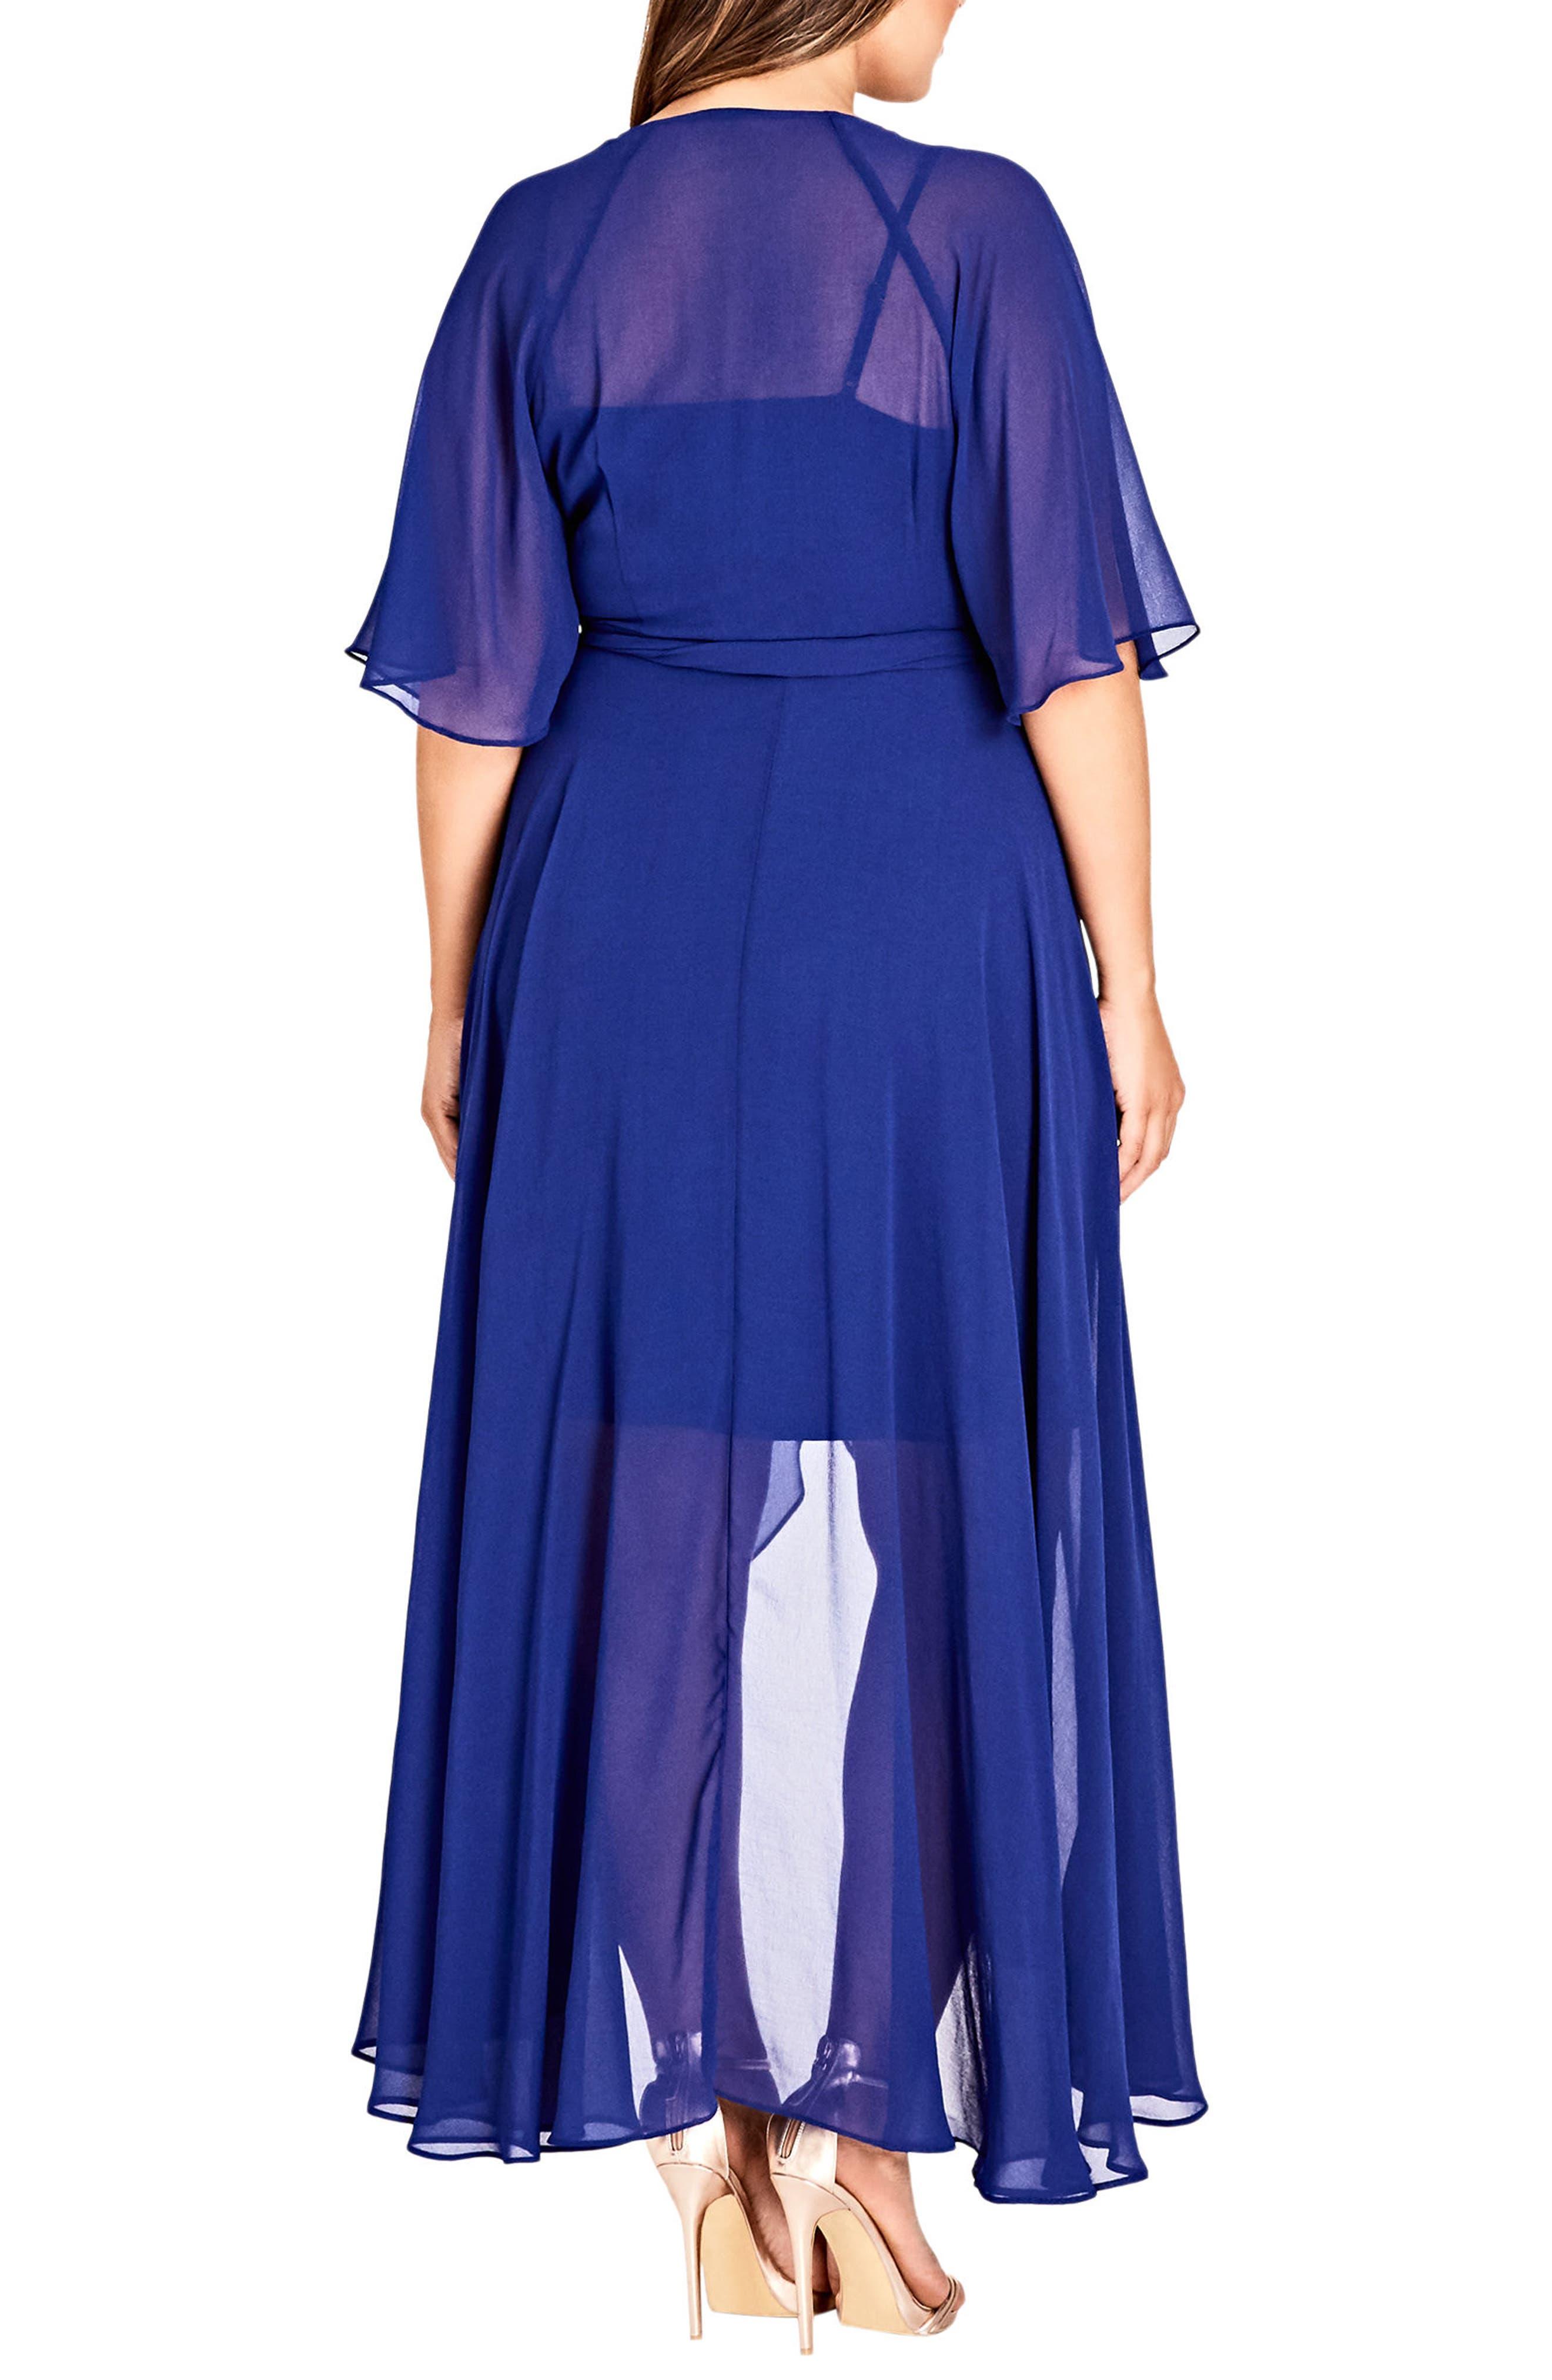 Enthrall Me High/Low Dress,                             Alternate thumbnail 2, color,                             Lapis